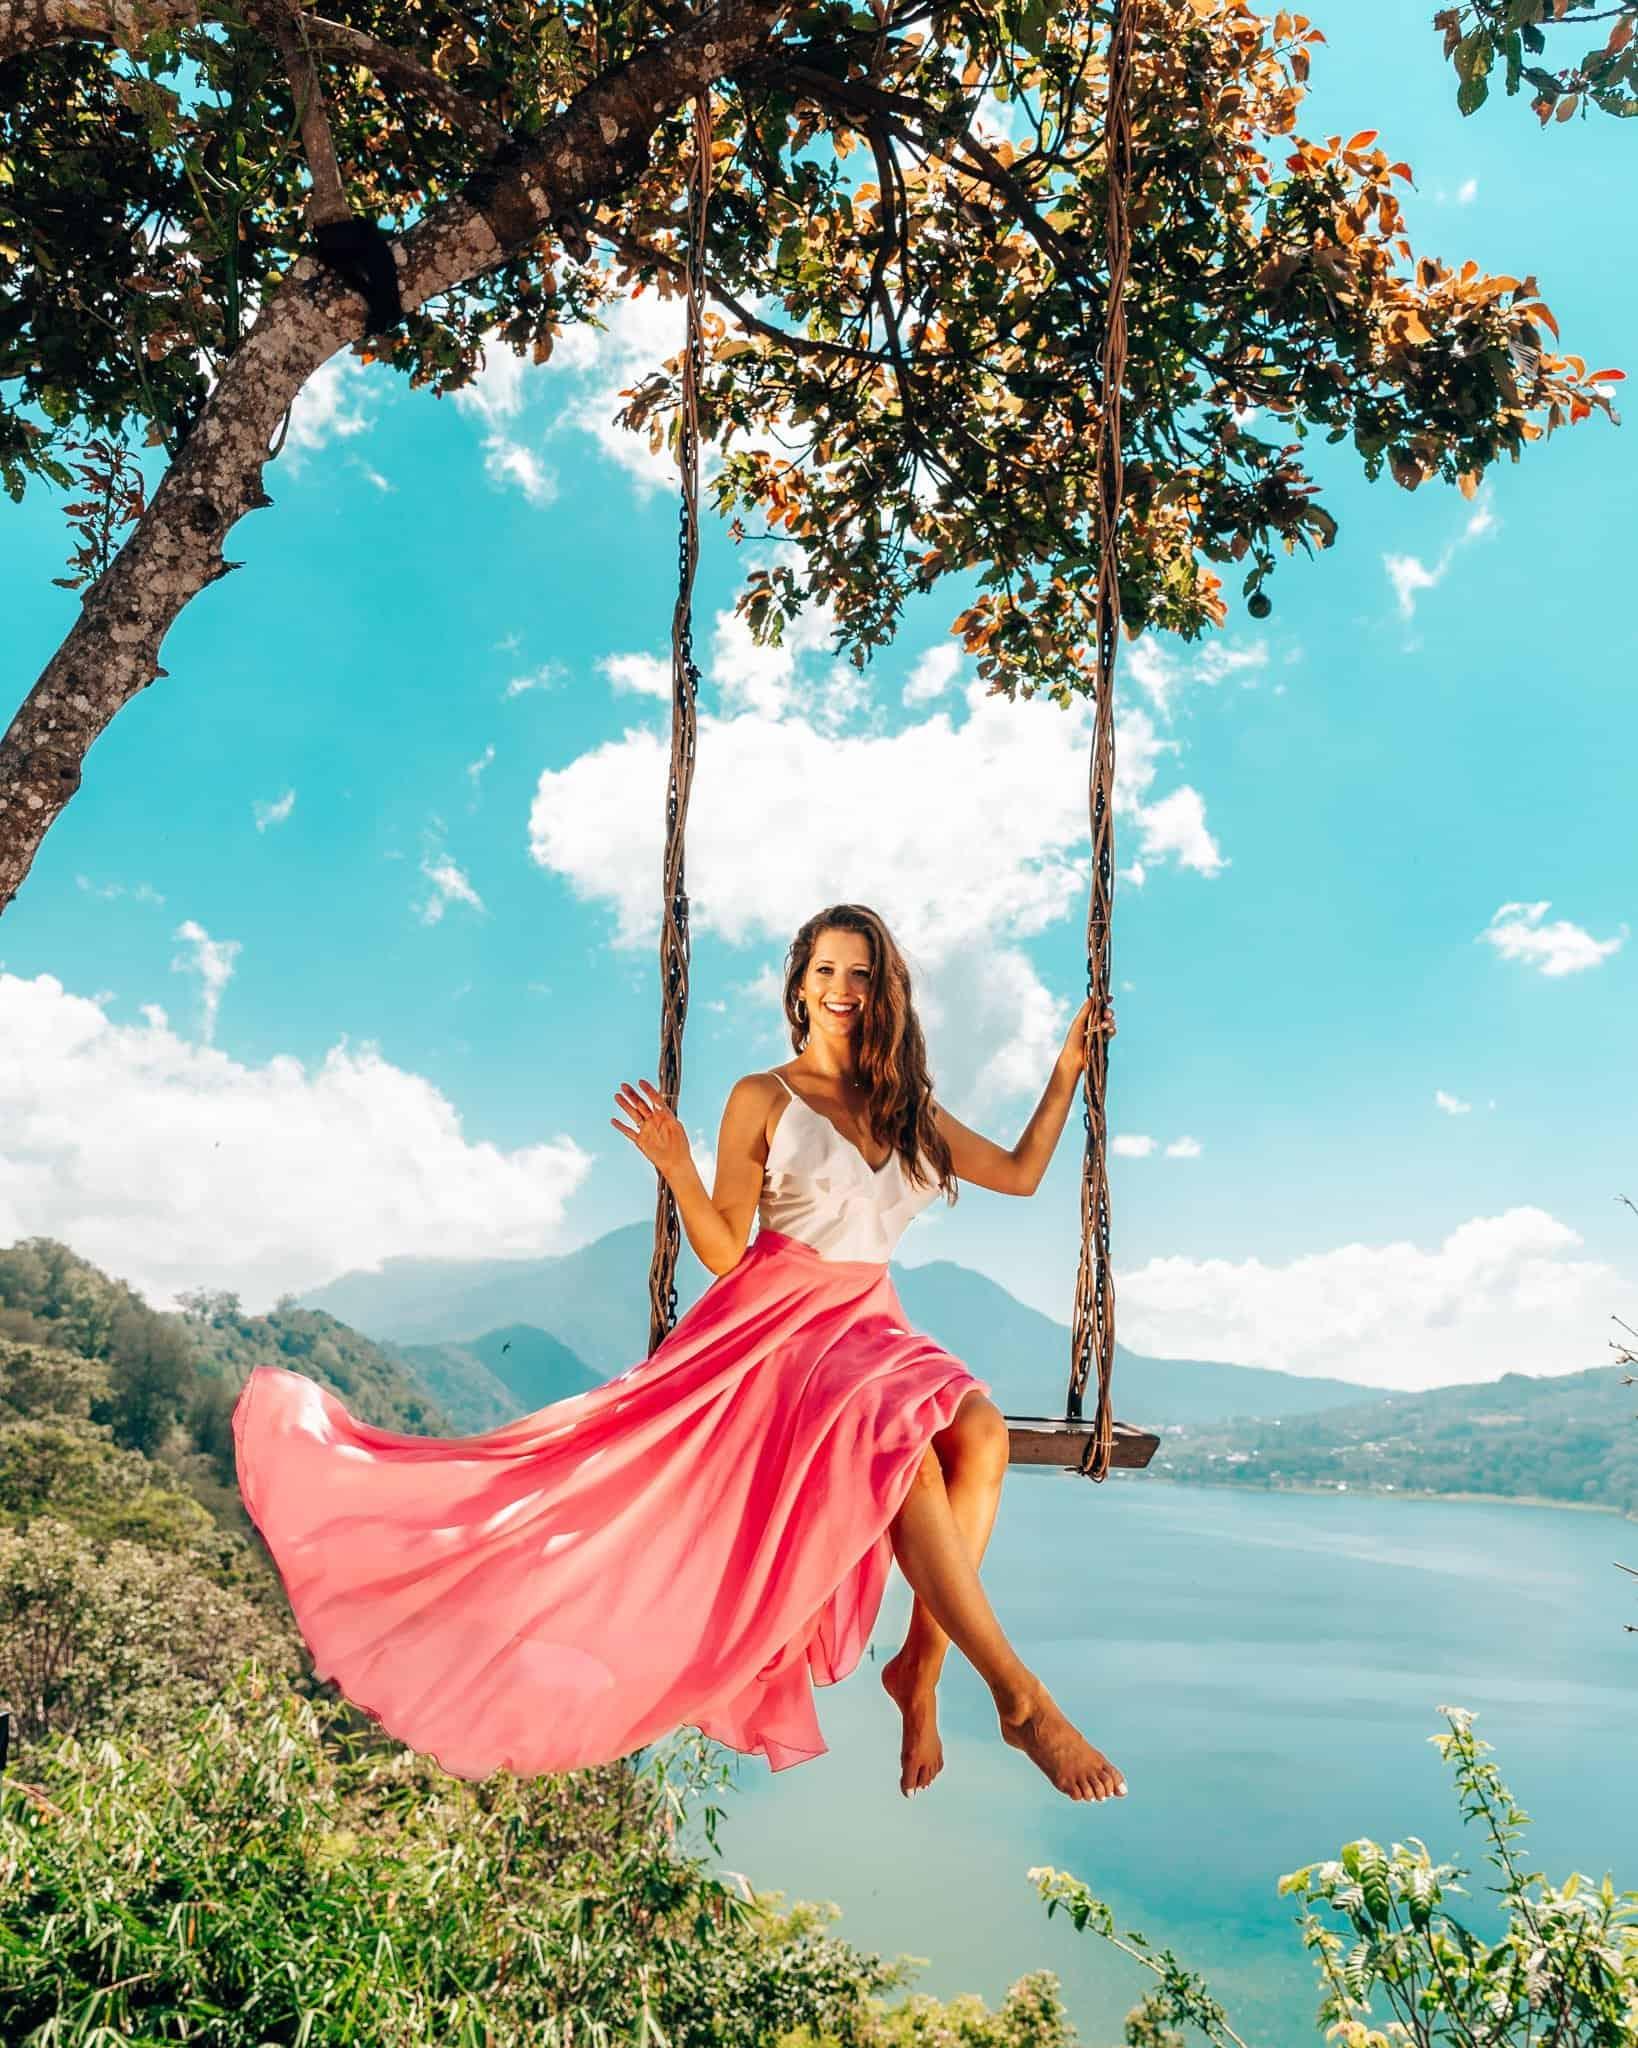 Bali Swing Hidden Hills Wanagiri Bali - The Next Trip